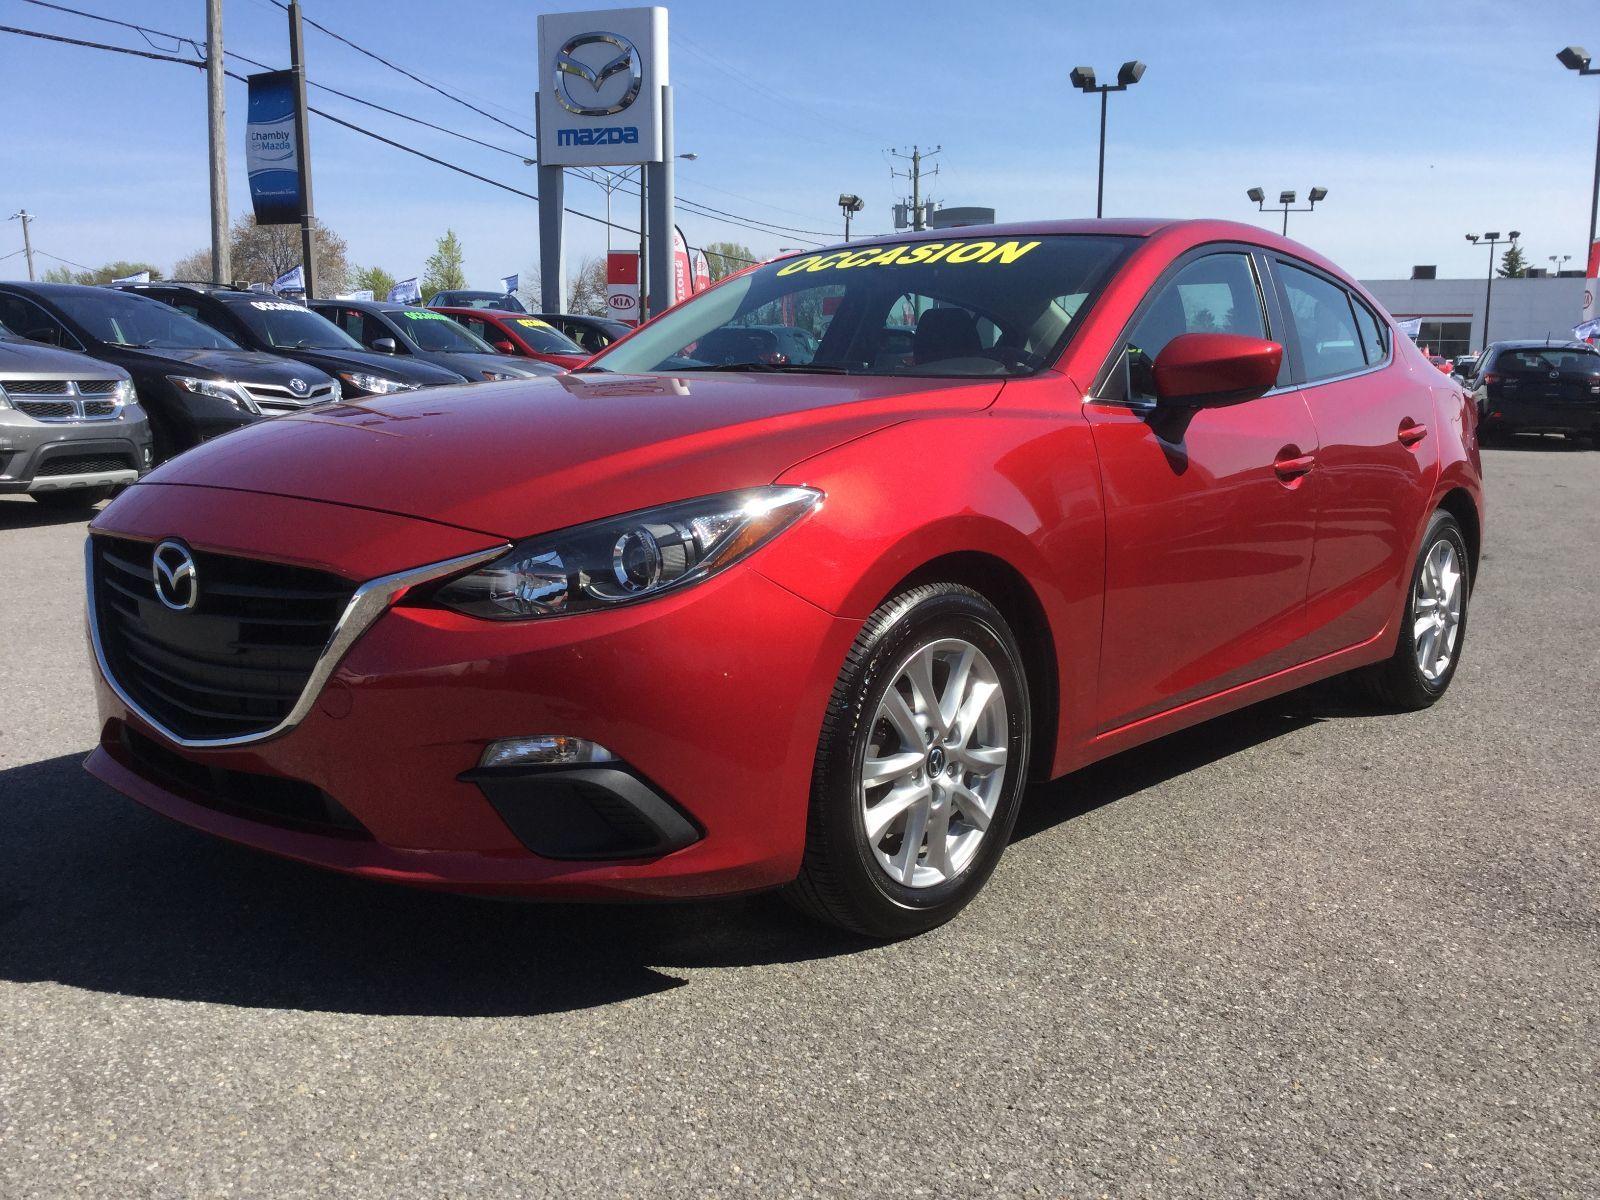 Mazda Mazda3 GS-SKY, SIEGES CHAUFFANTS, BLUETOOTH, CAMERA, MAGS 2014 UN SEUL PROPRIÉTAIRE